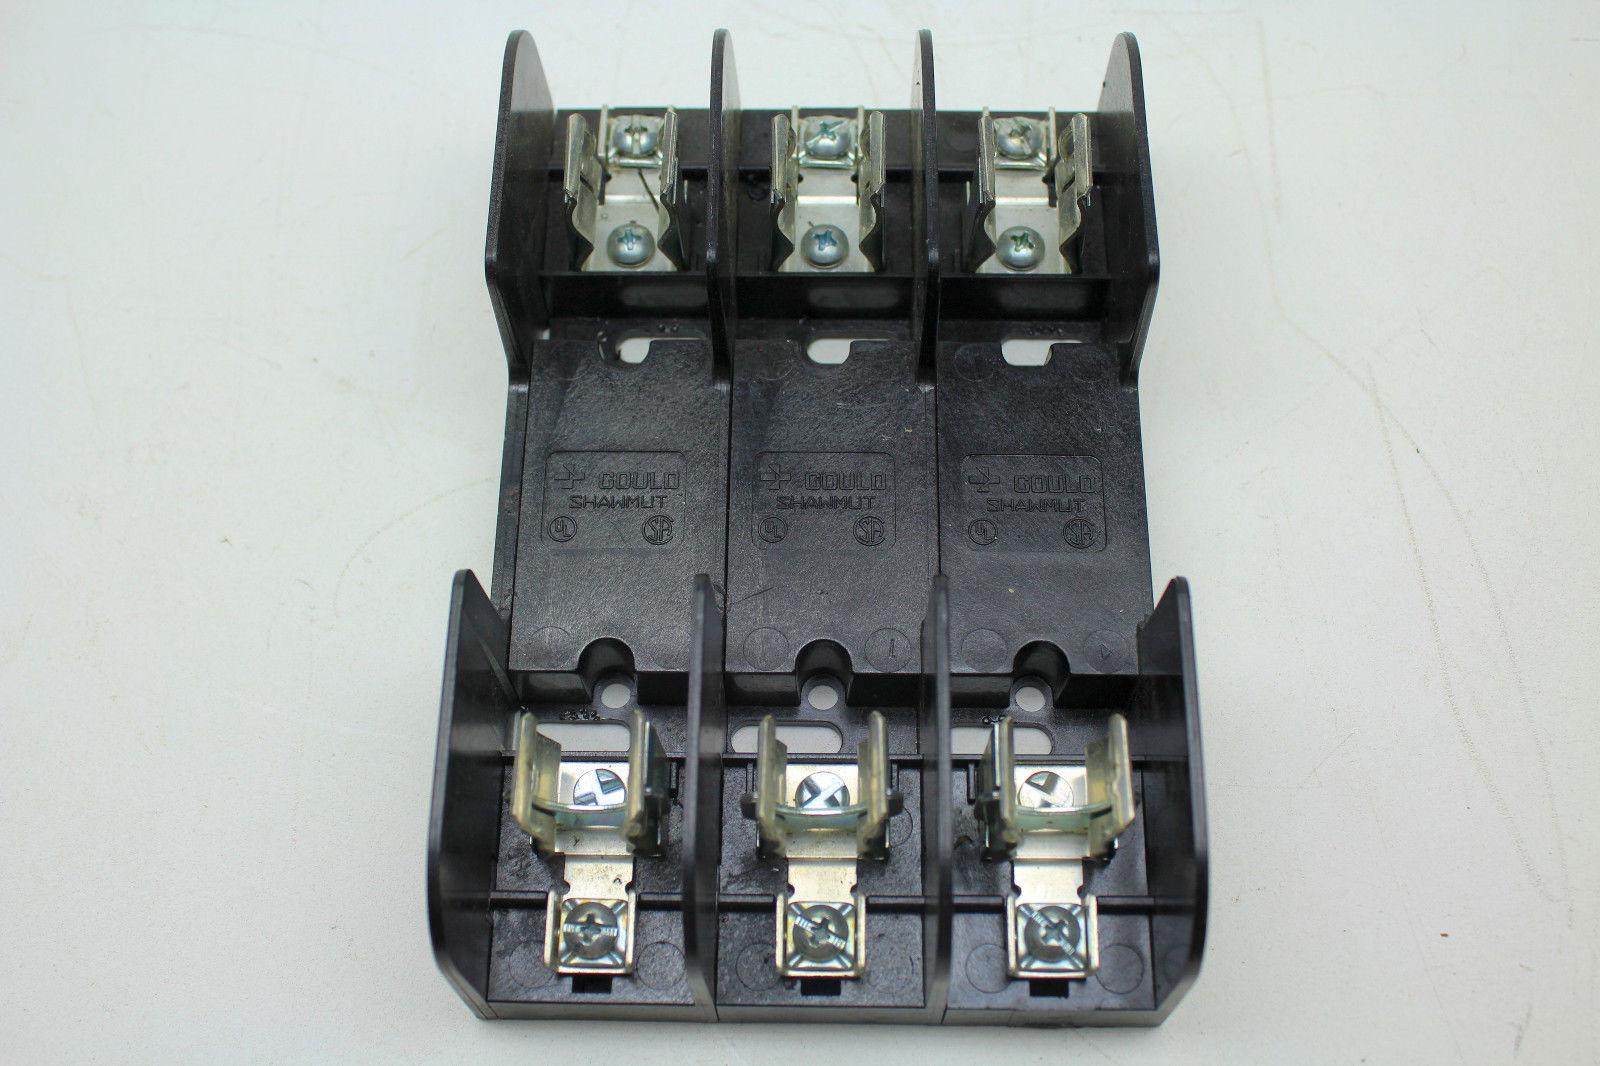 Gould Shawmut 60328R 600V 200,000 AMP RMS SYSTEM RATING